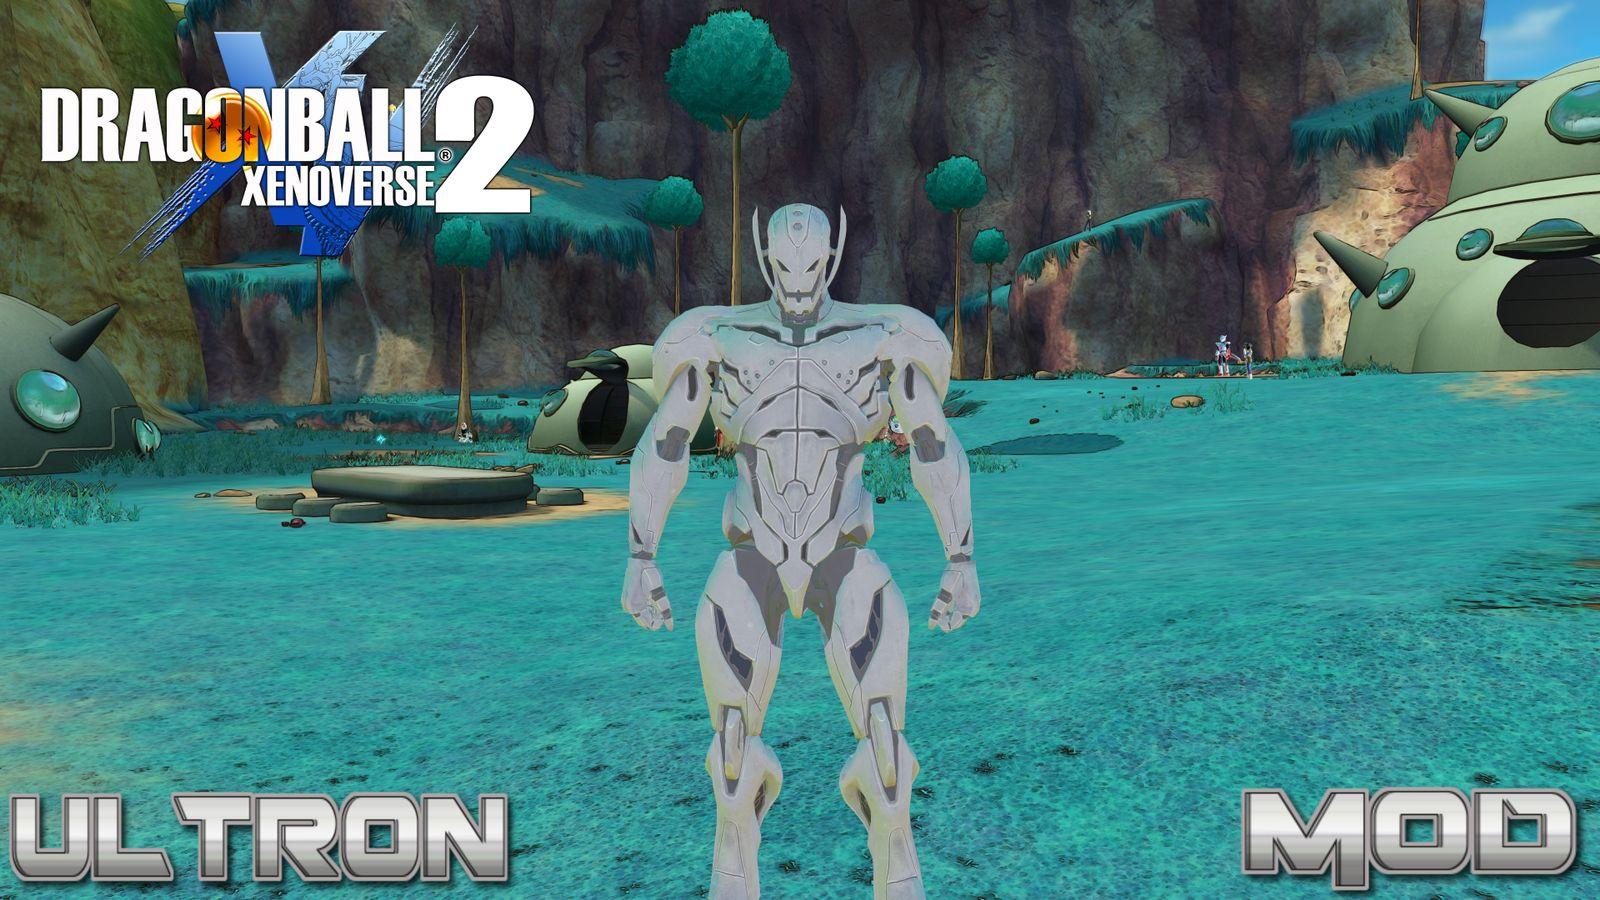 Dragon Ball Xenoverse 2 Mod Mvsci Ultron файлы патч